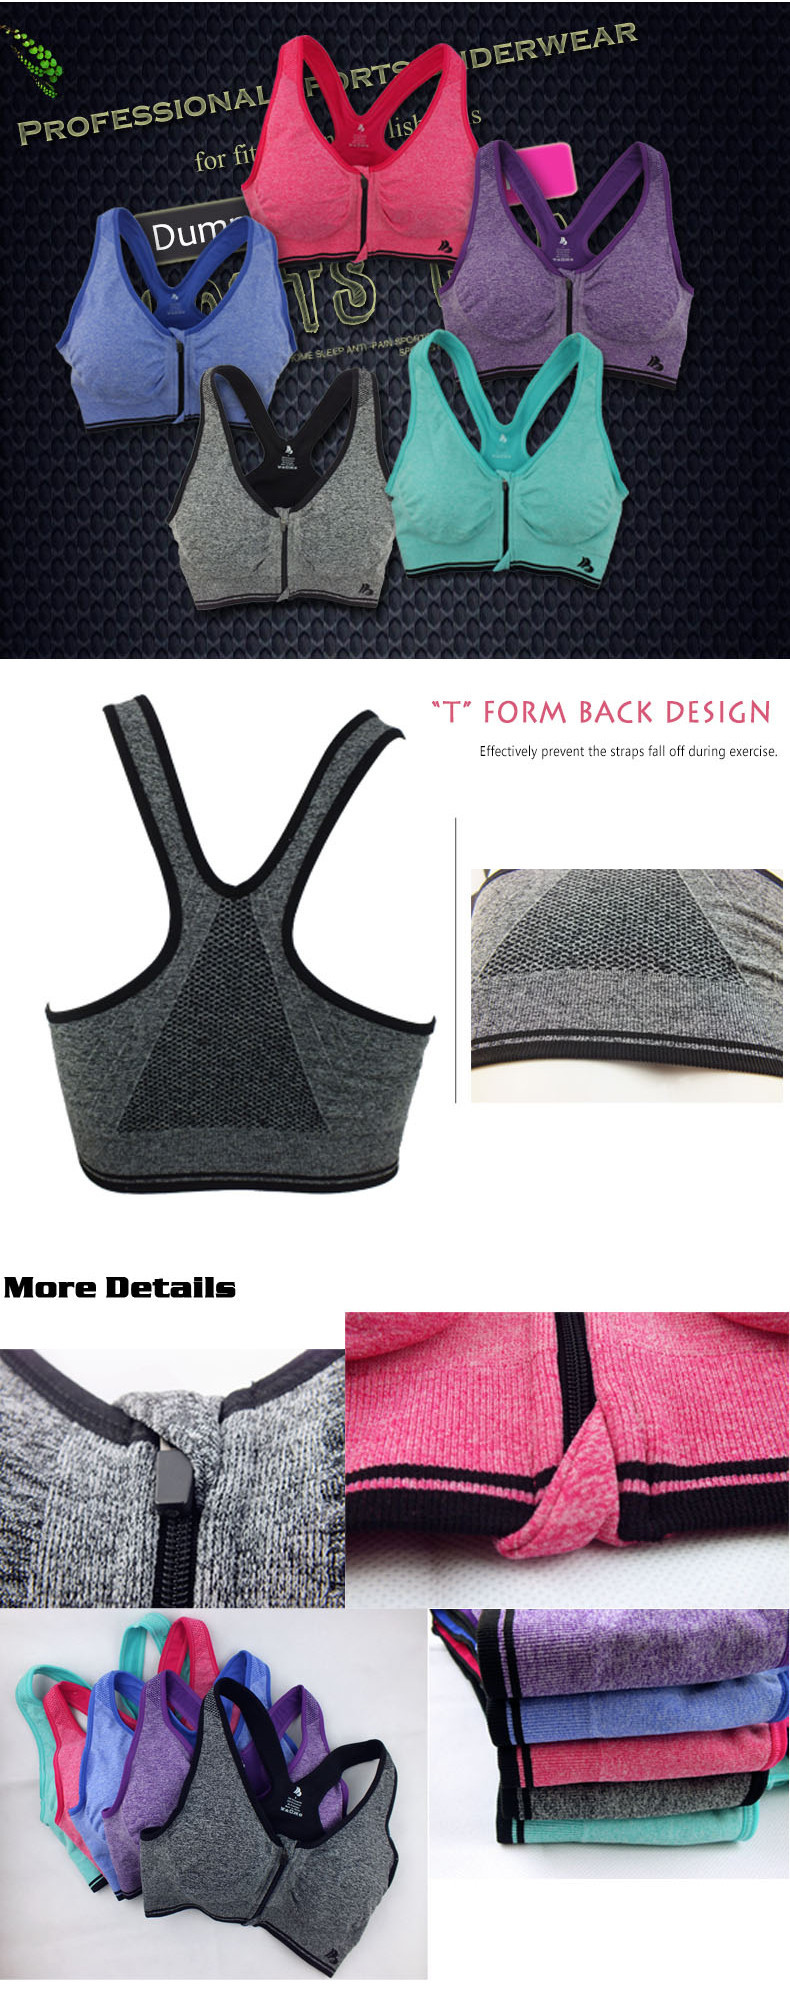 B.BANG Women's Bras Zipper Front Push Up Bra Shakeproof Intimate Crop Top Seamless Underwear Free Shipping 23